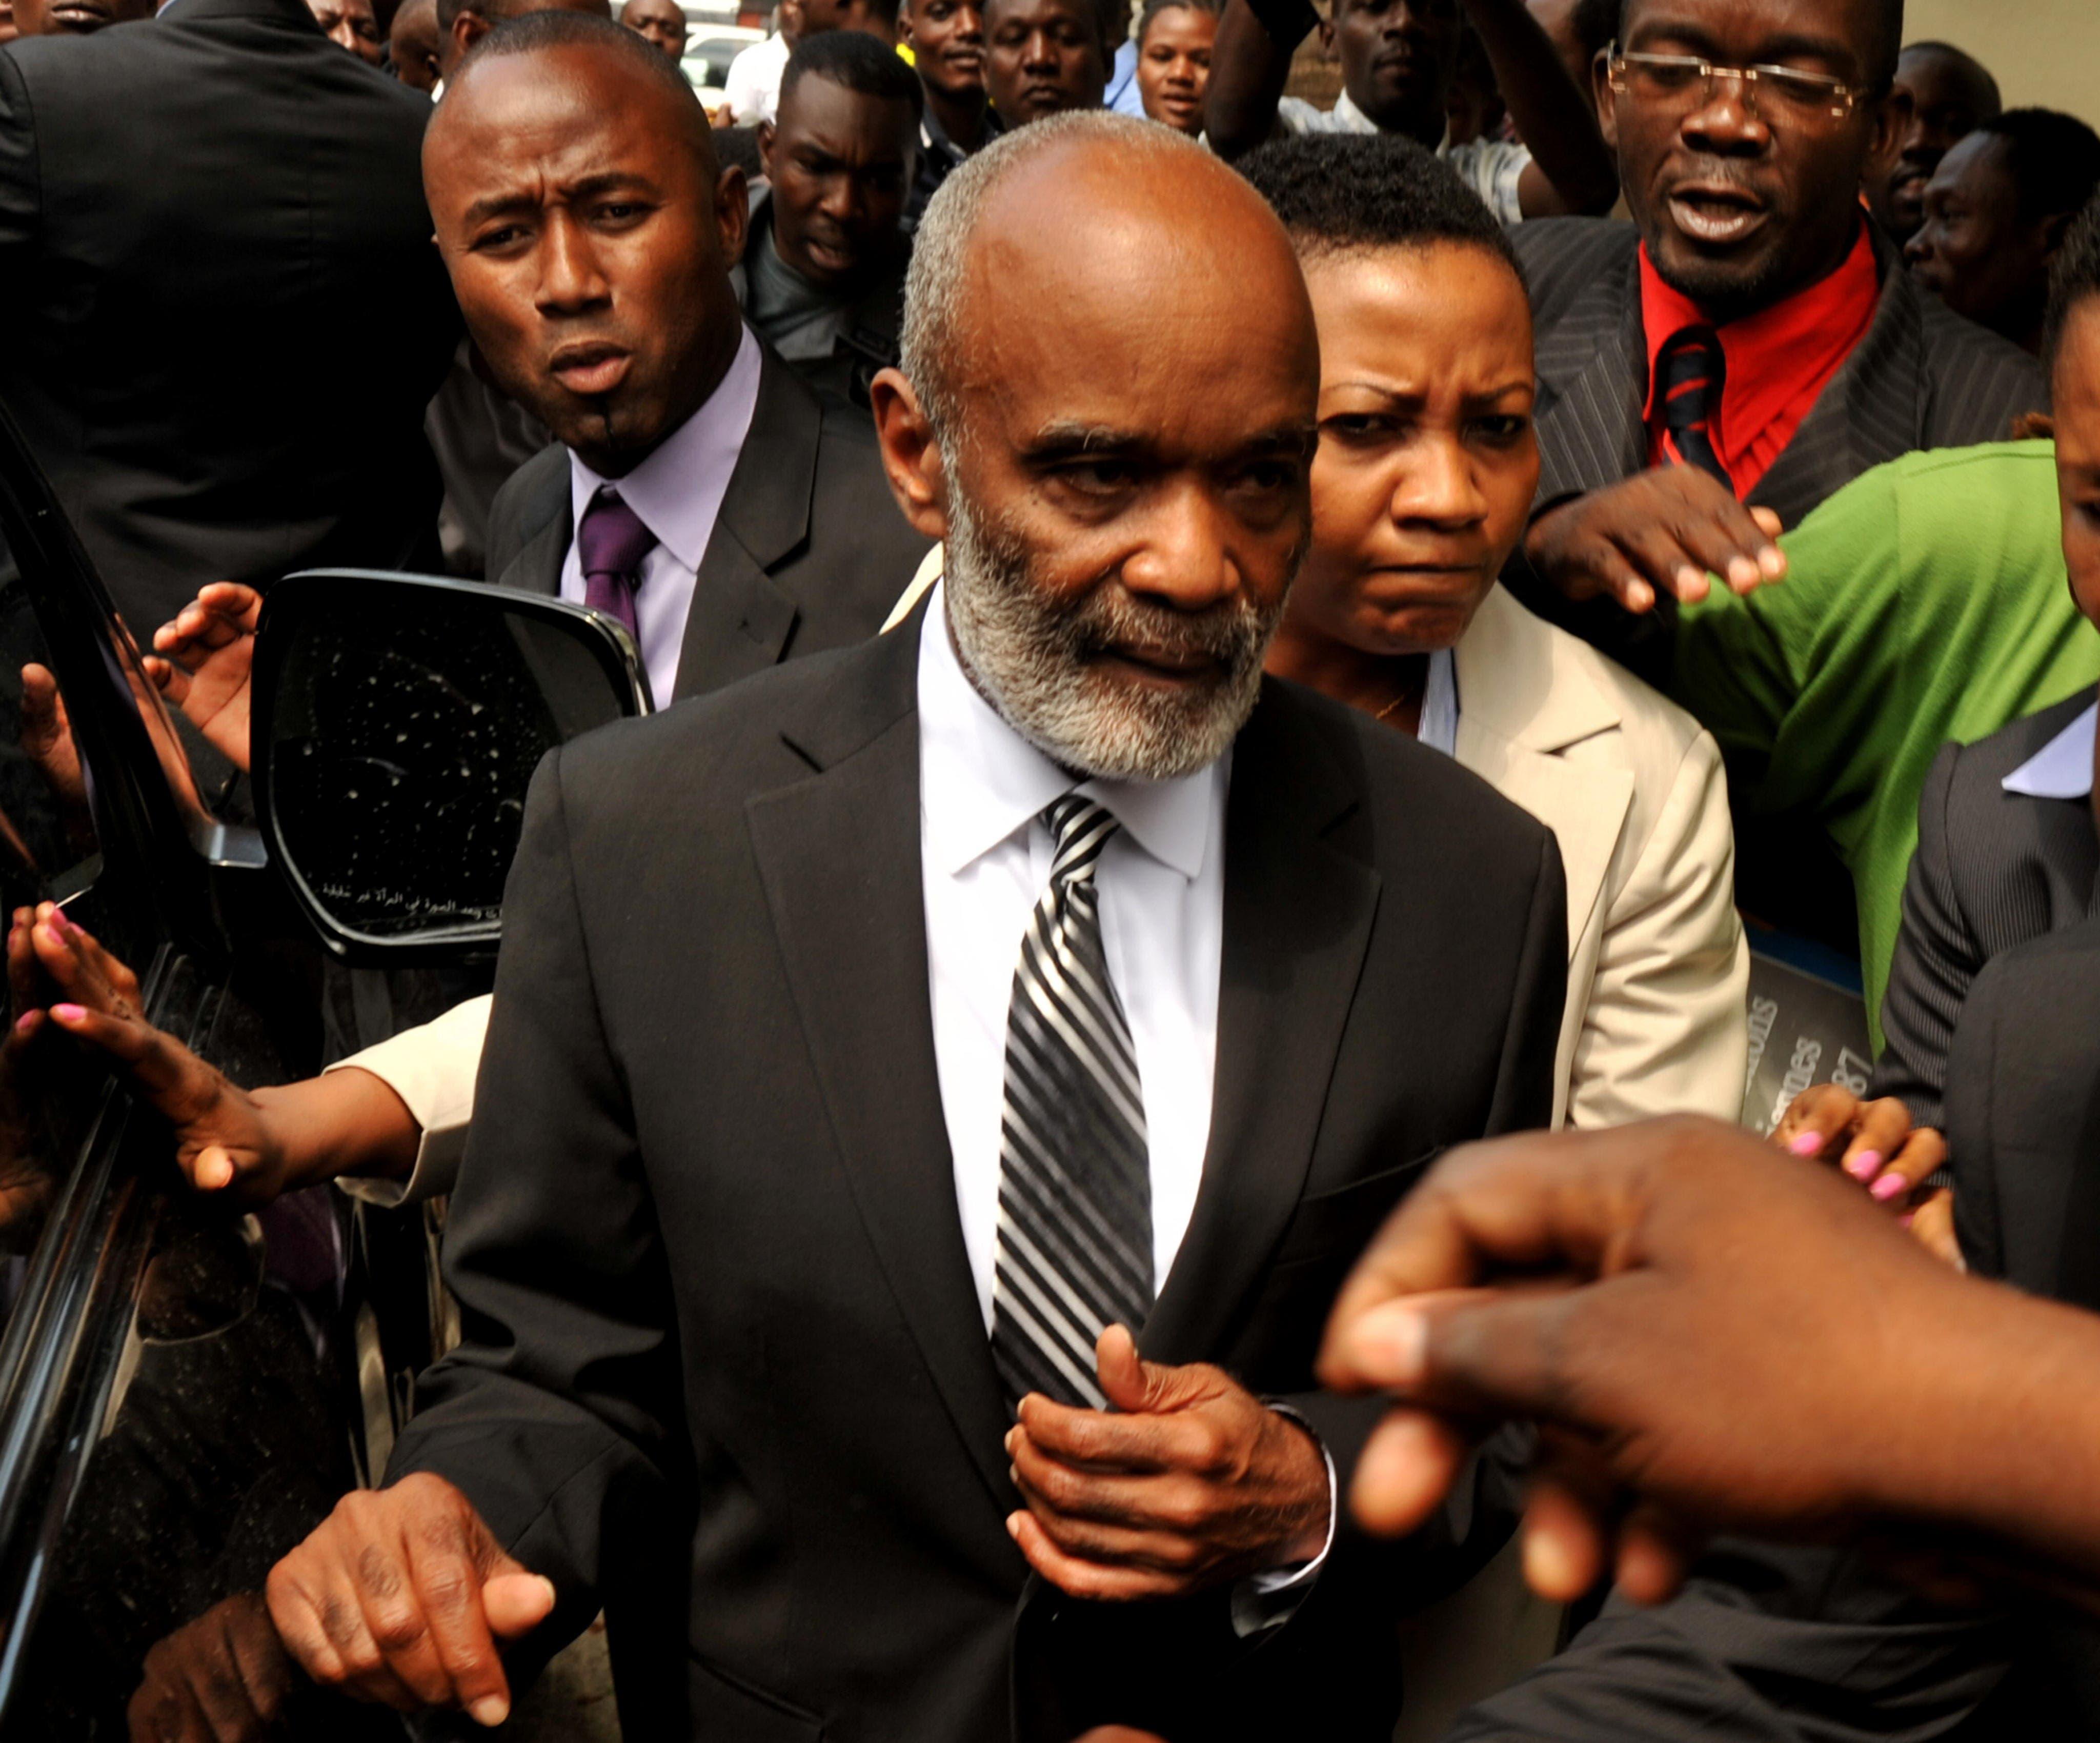 Autopsia de expresidente Préval concluye murió de causas naturales